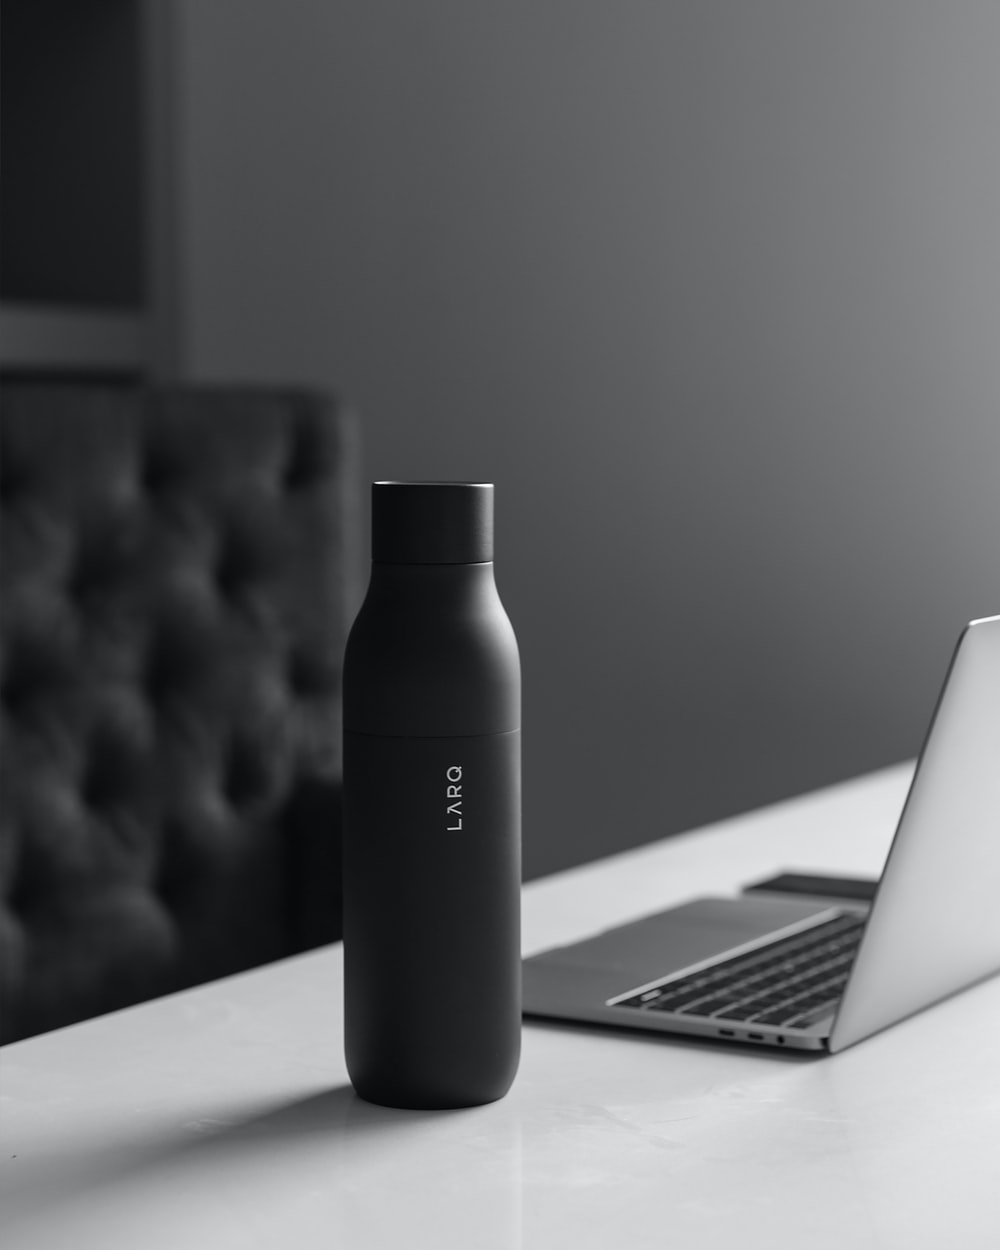 black bottle beside silver laptop computer on table